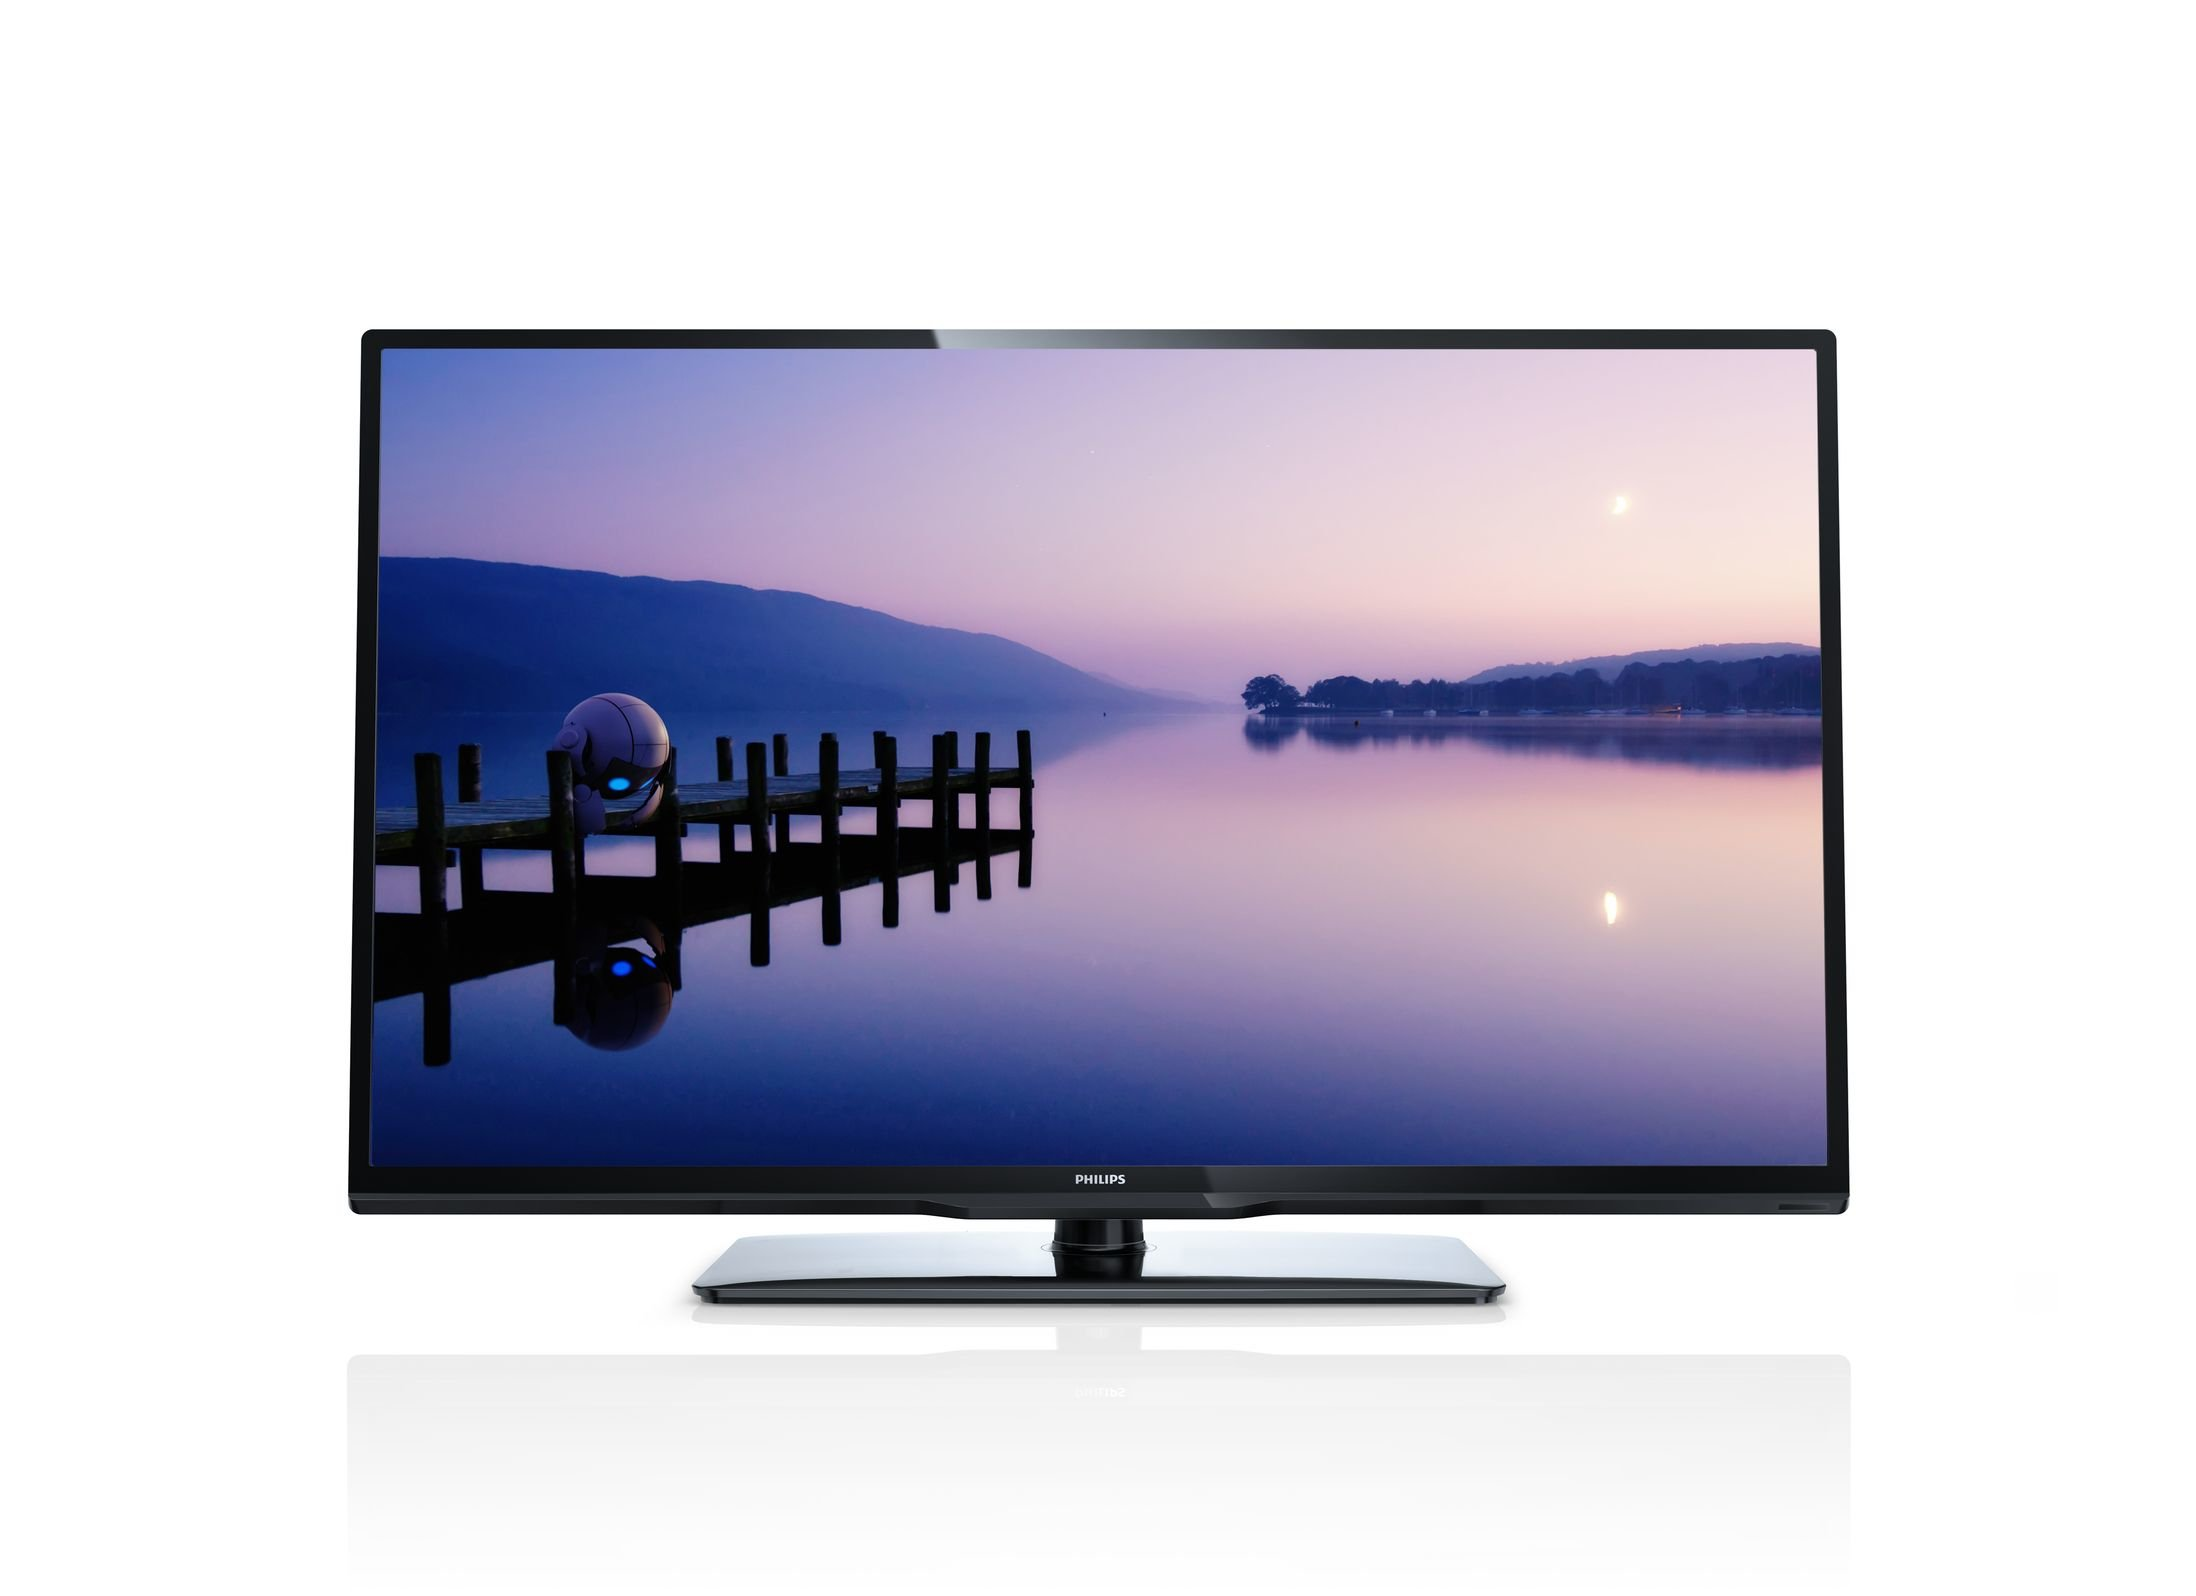 Philips 46PFL3108H/12 - Televisor LED de 46 pulgadas, Full HD, 100 Hz: Amazon.es: Electrónica